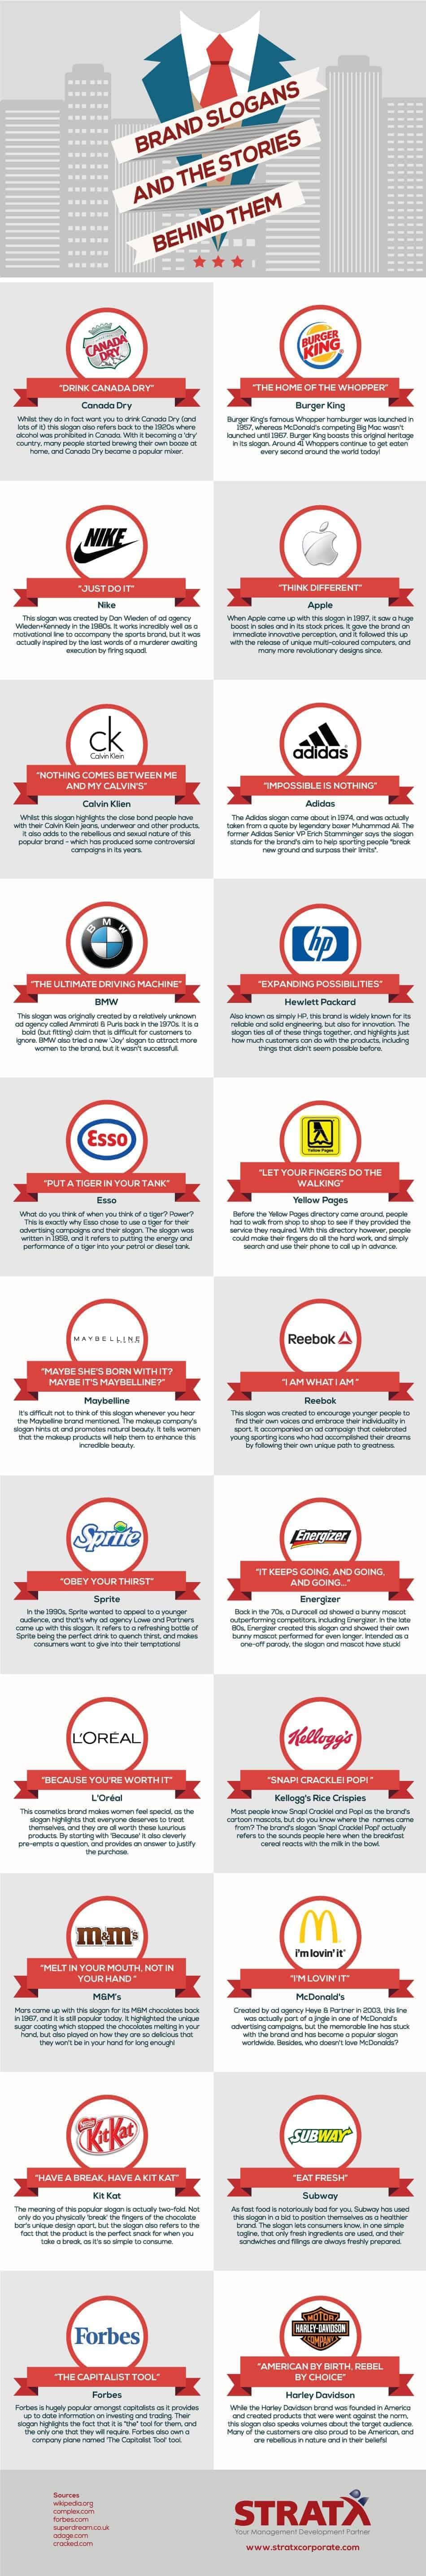 history behind popular brand slogans